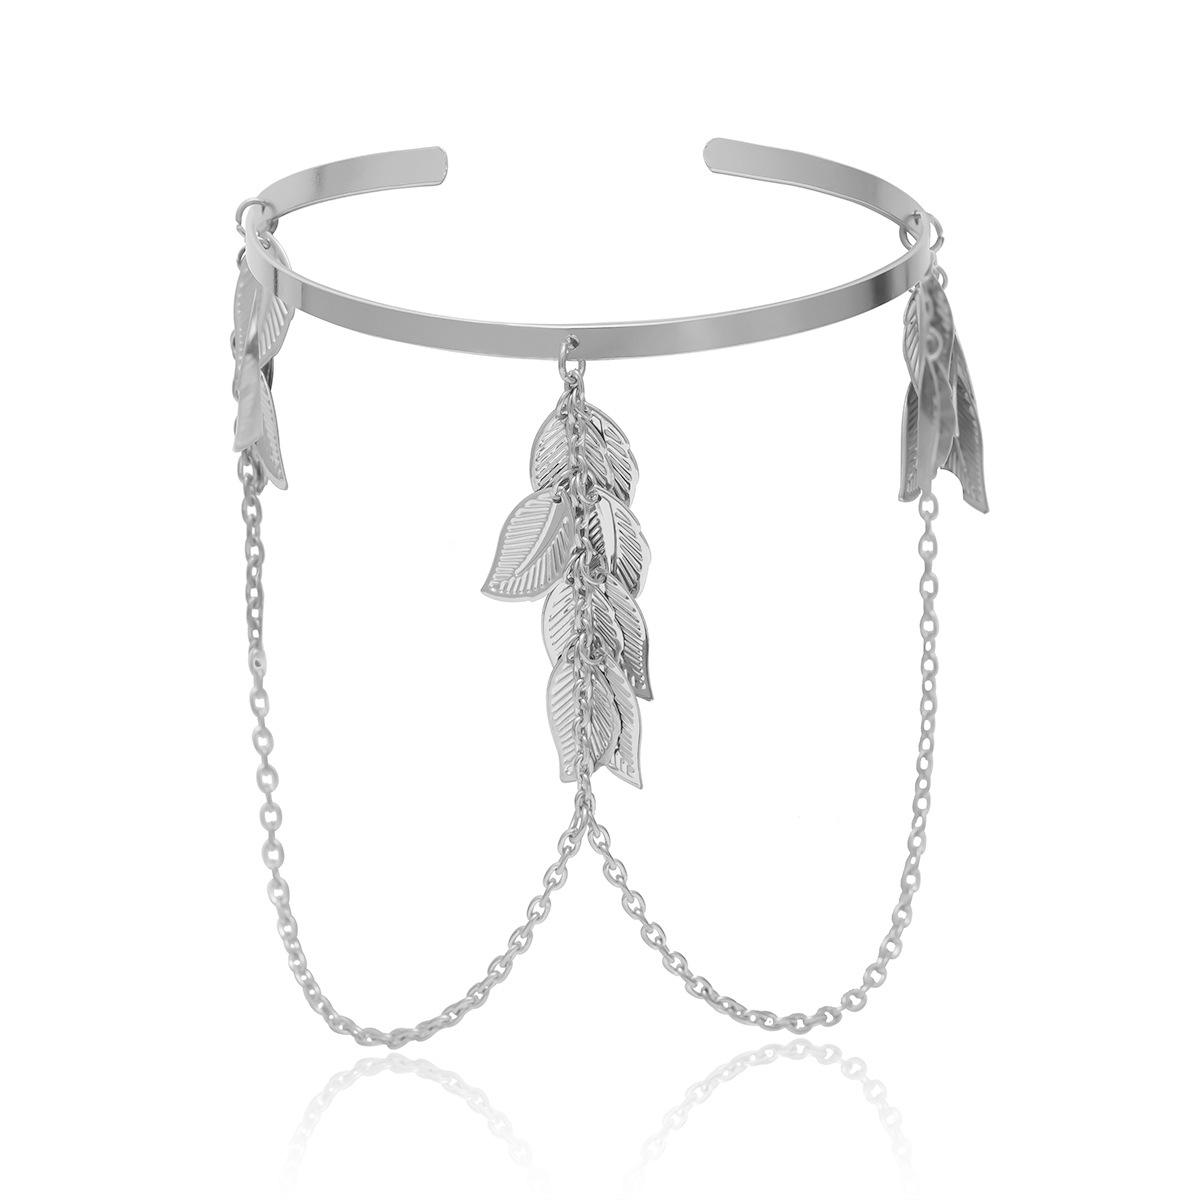 Geometric leaves fringed chain pendant arm bracelet NHXR141818